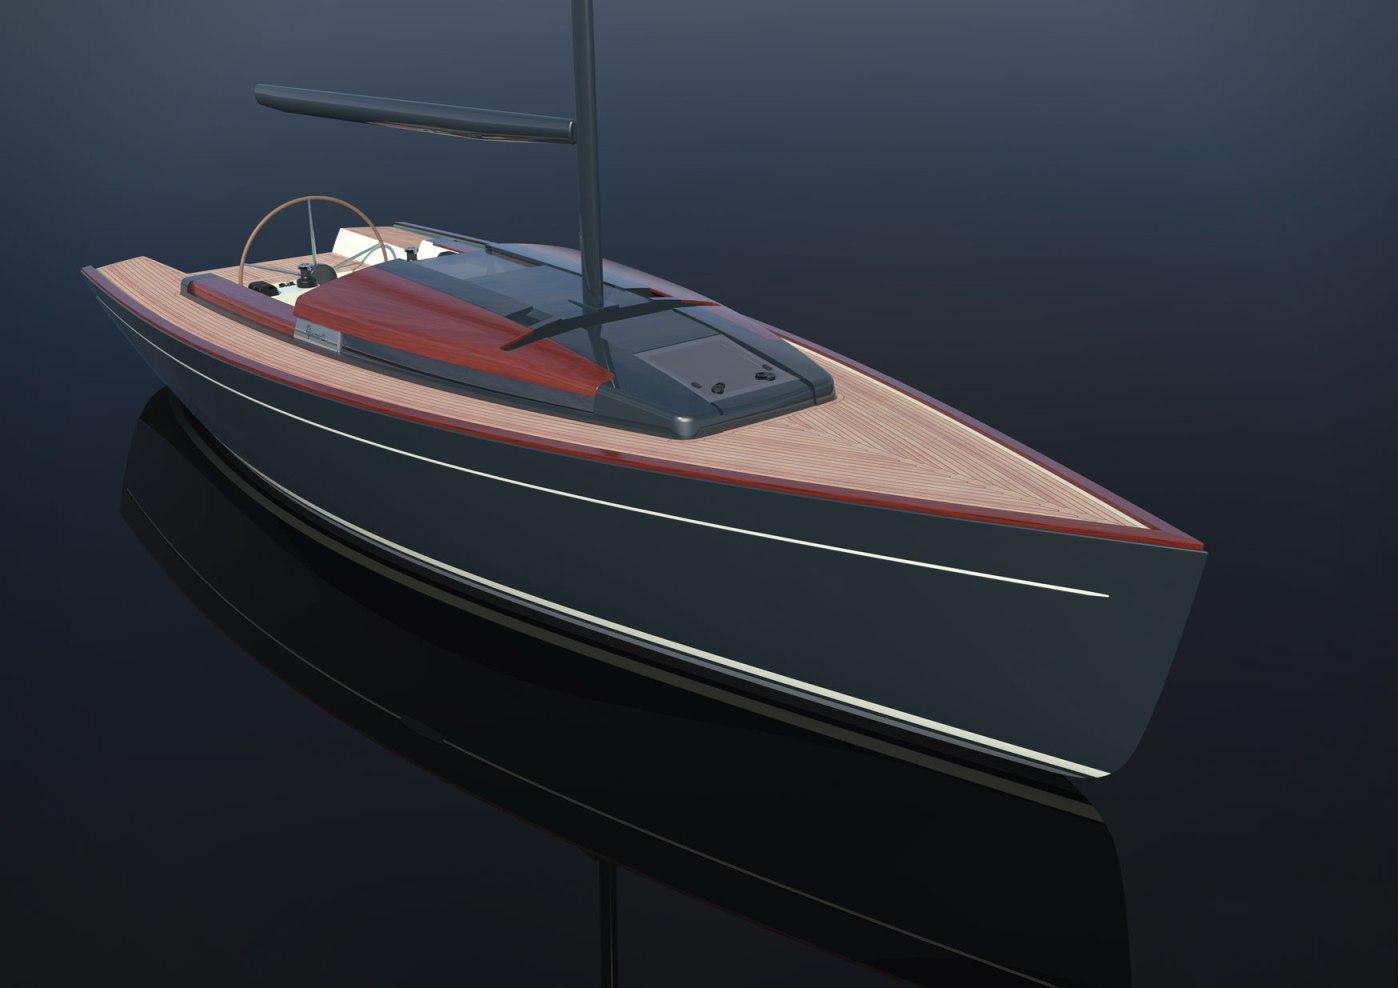 Latitude 46 Tofinou 10 (Sailing Yacht)